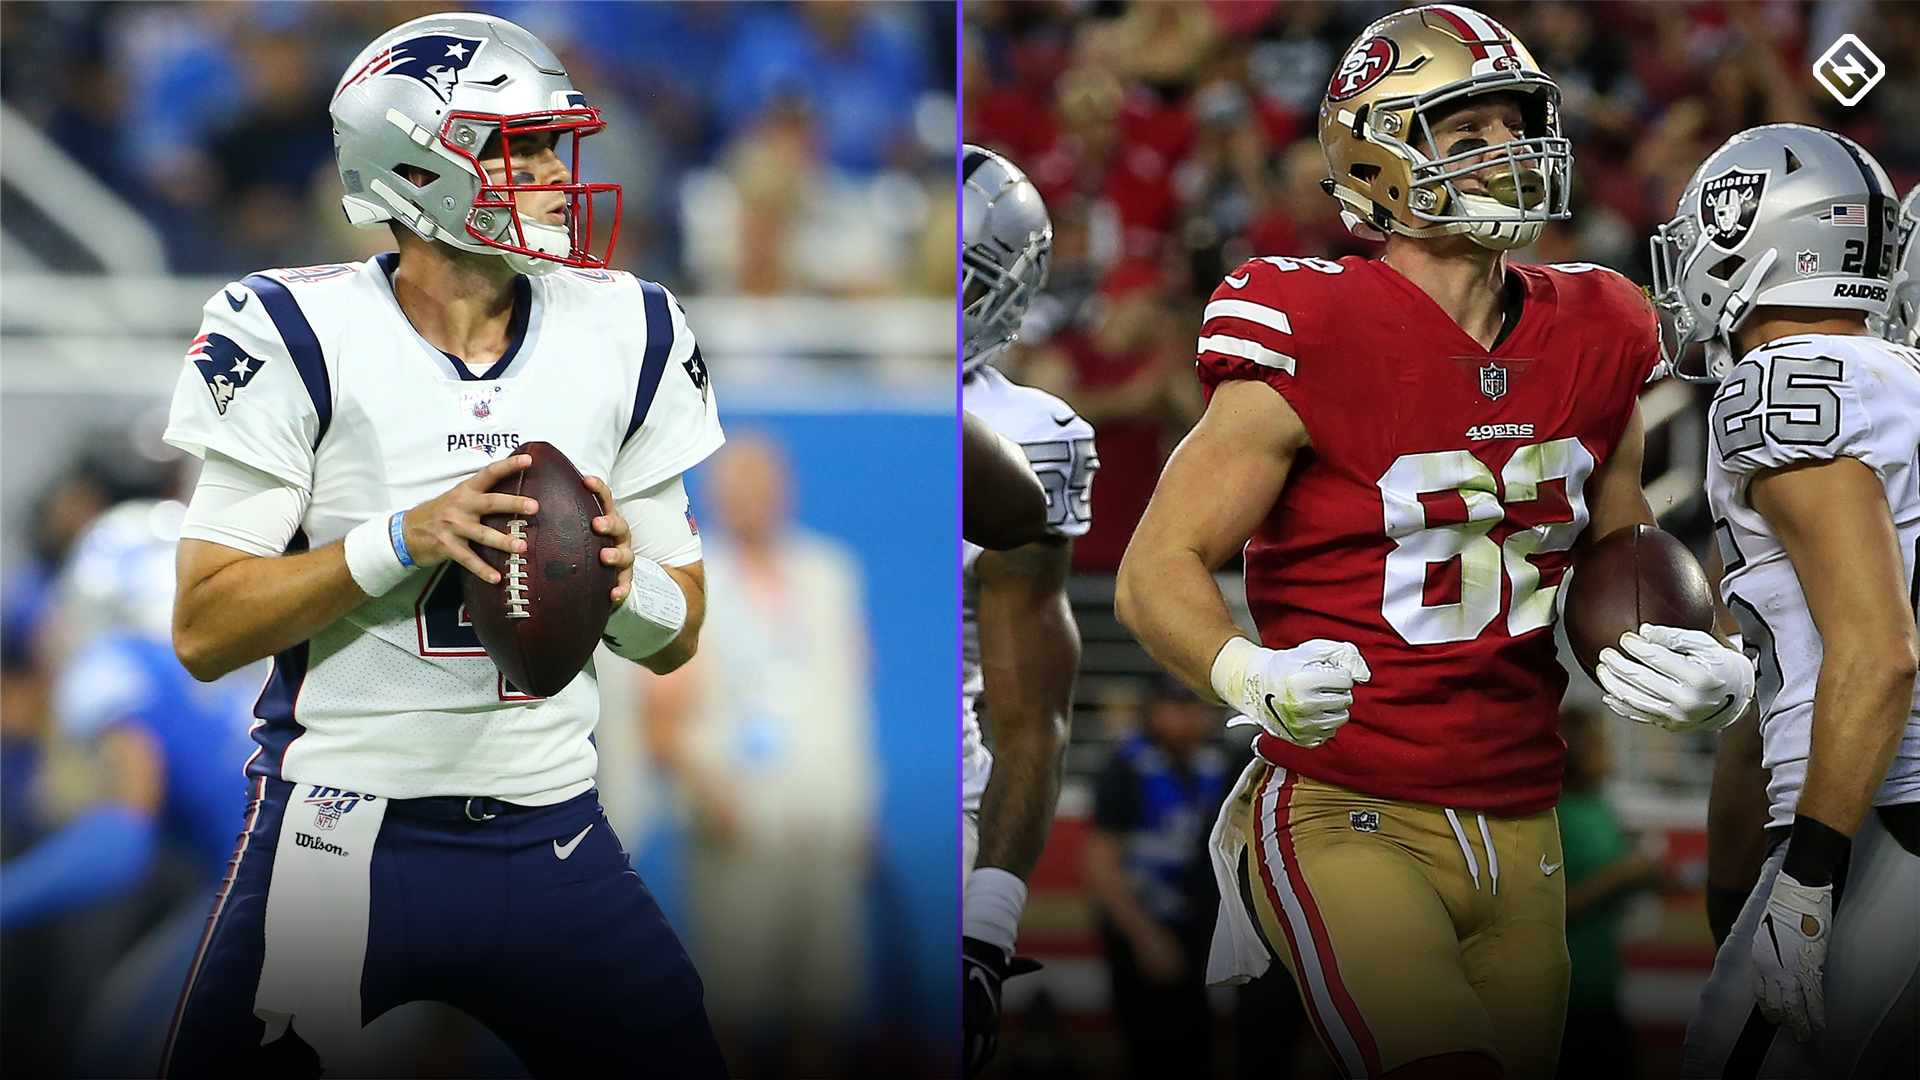 Preseason Week 2 NFL DFS Picks: Lineup advice, sleepers